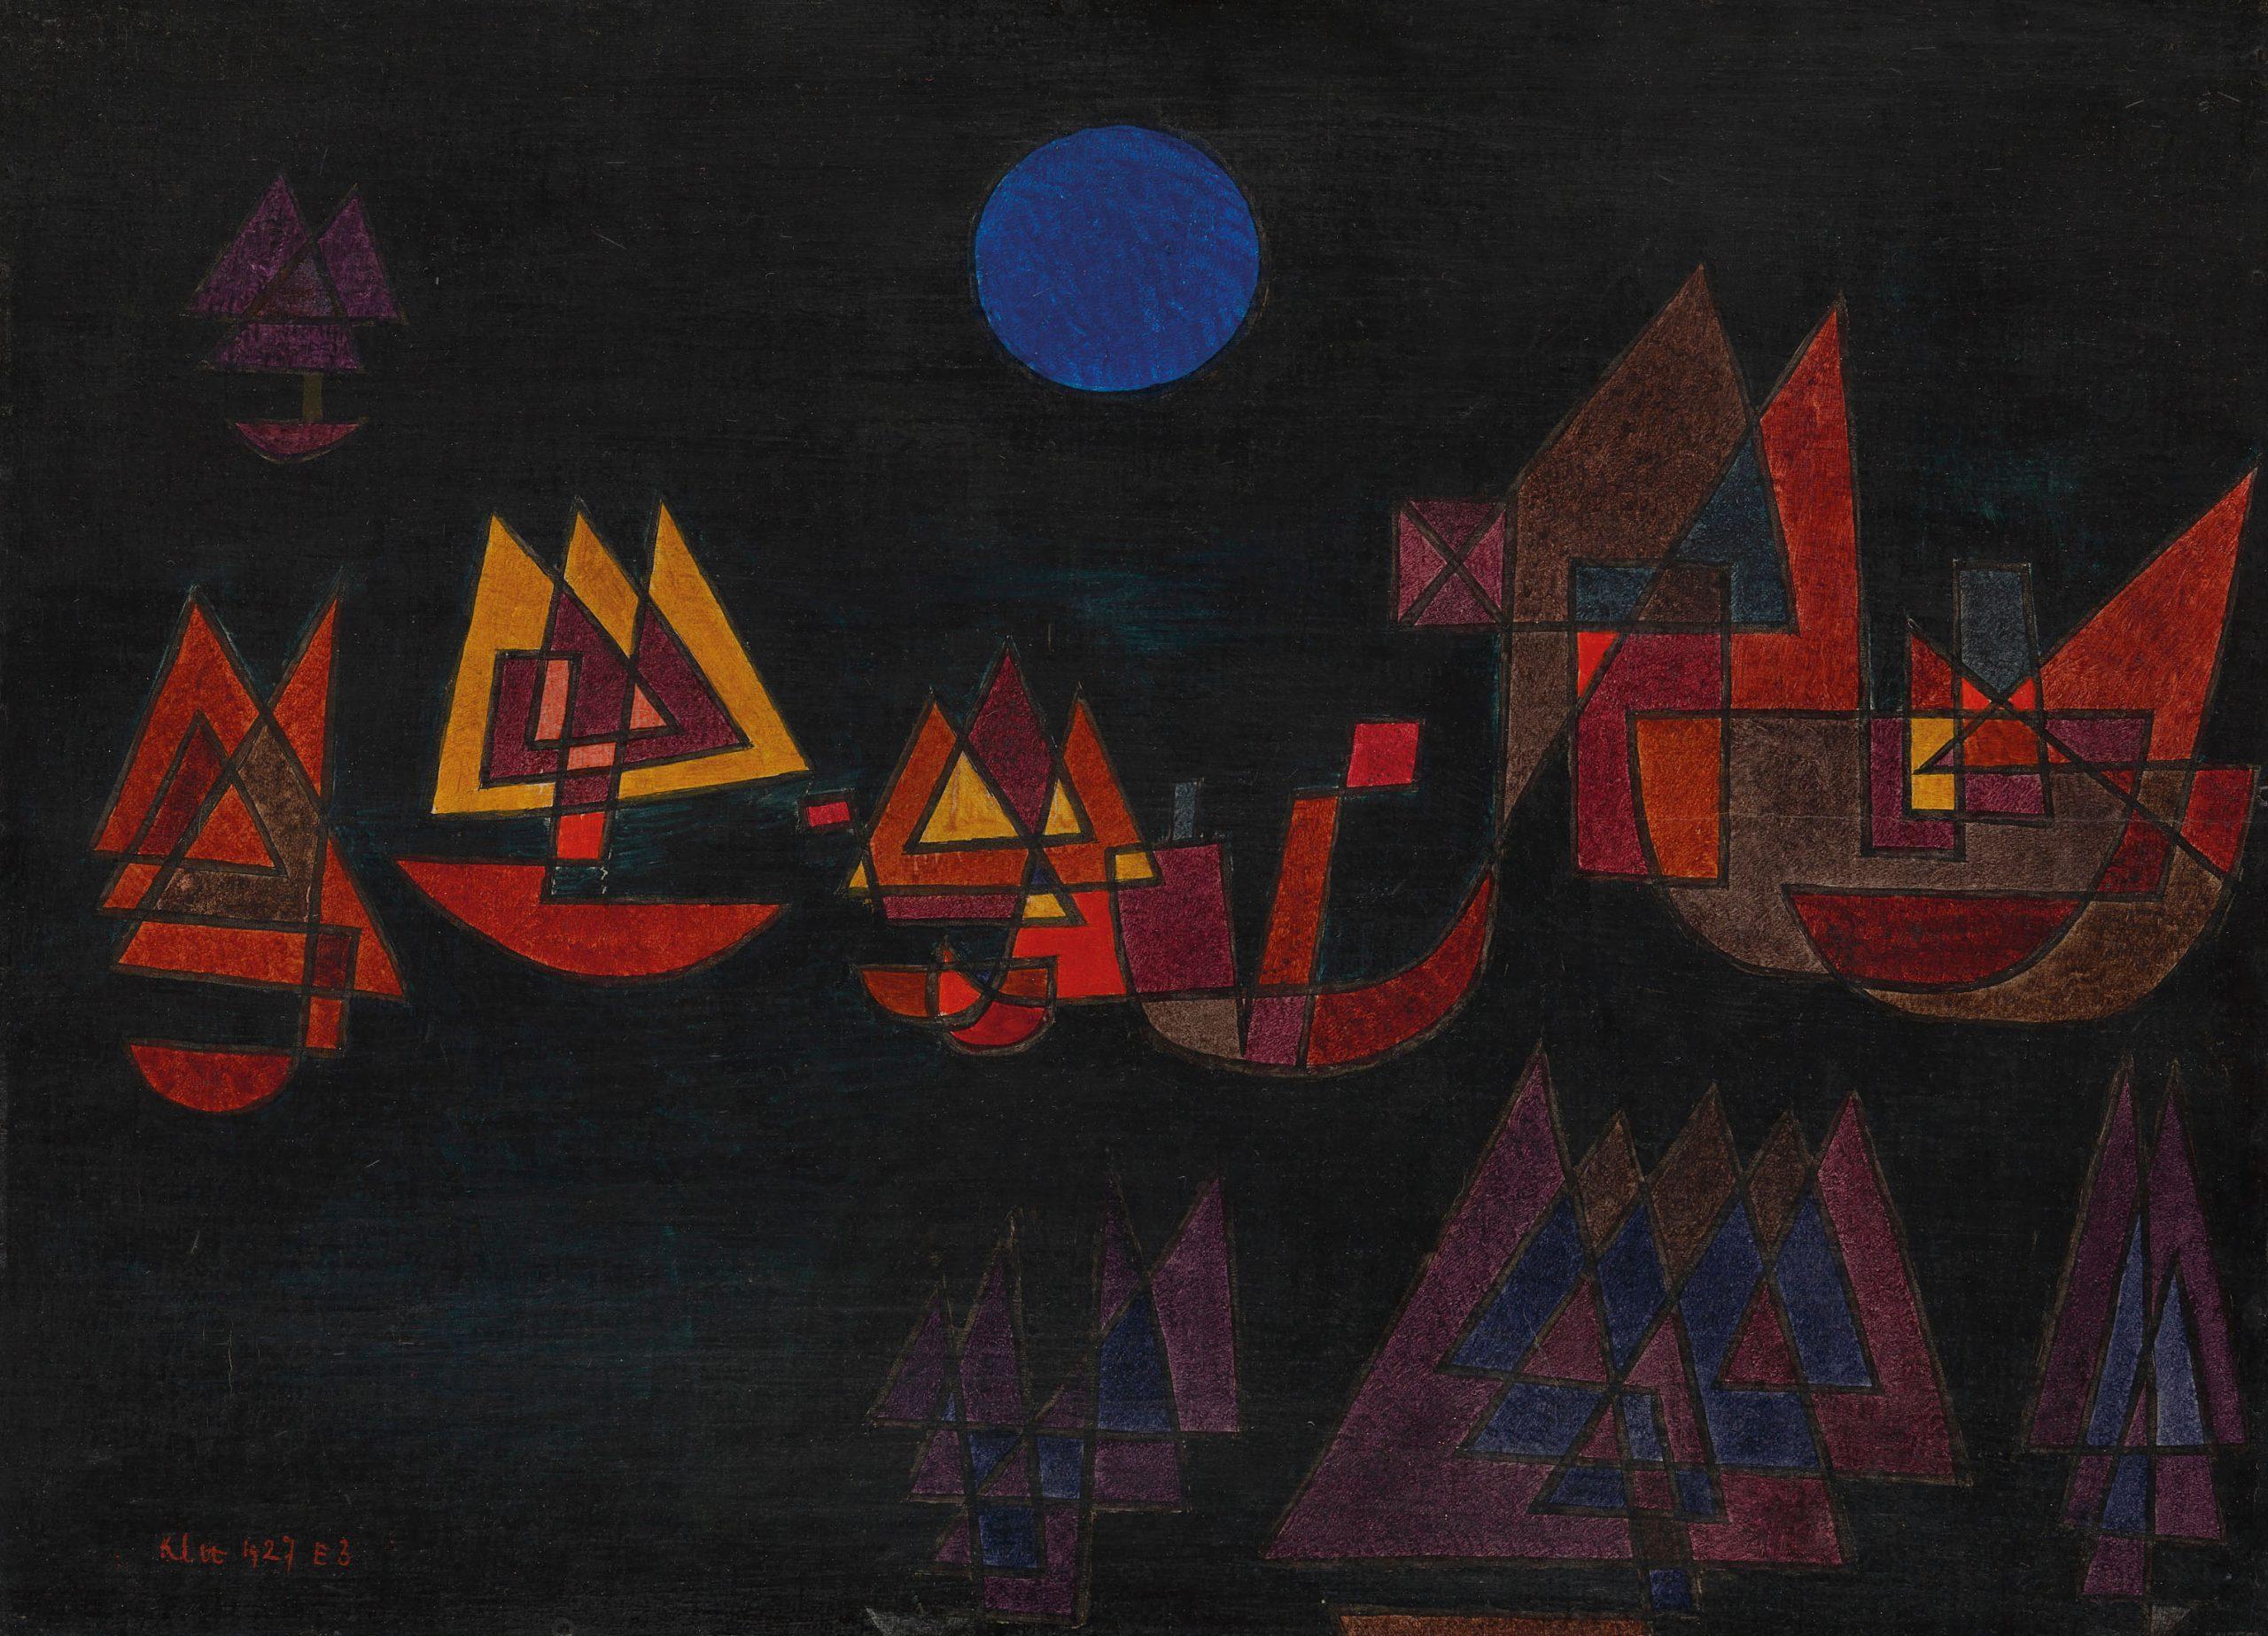 Paul Klee, Navi nel buio